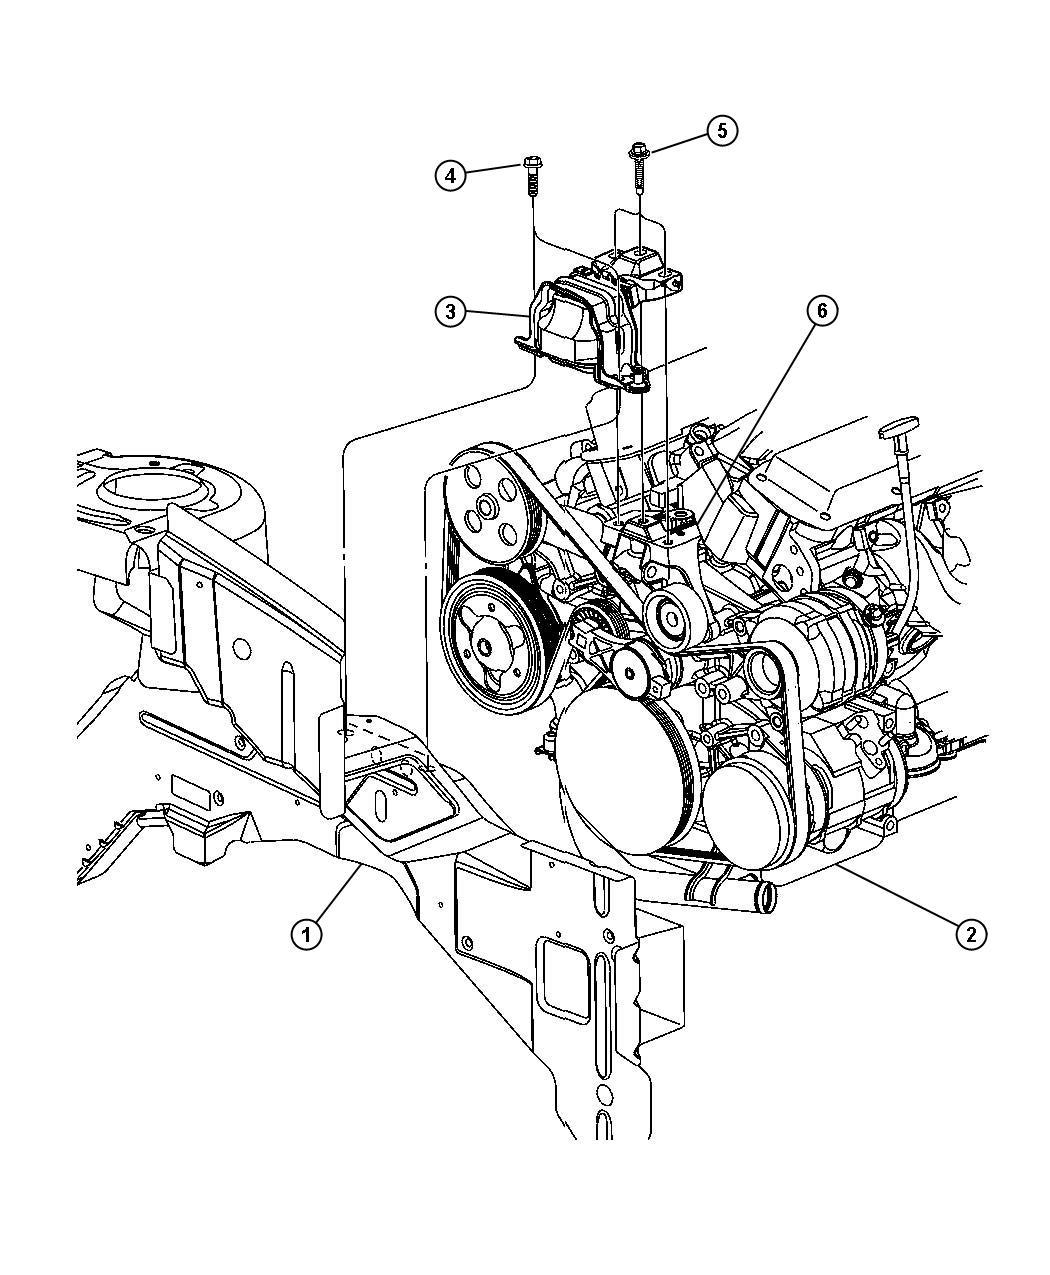 Dodge Caravan Mount Timing Chain Side Engine